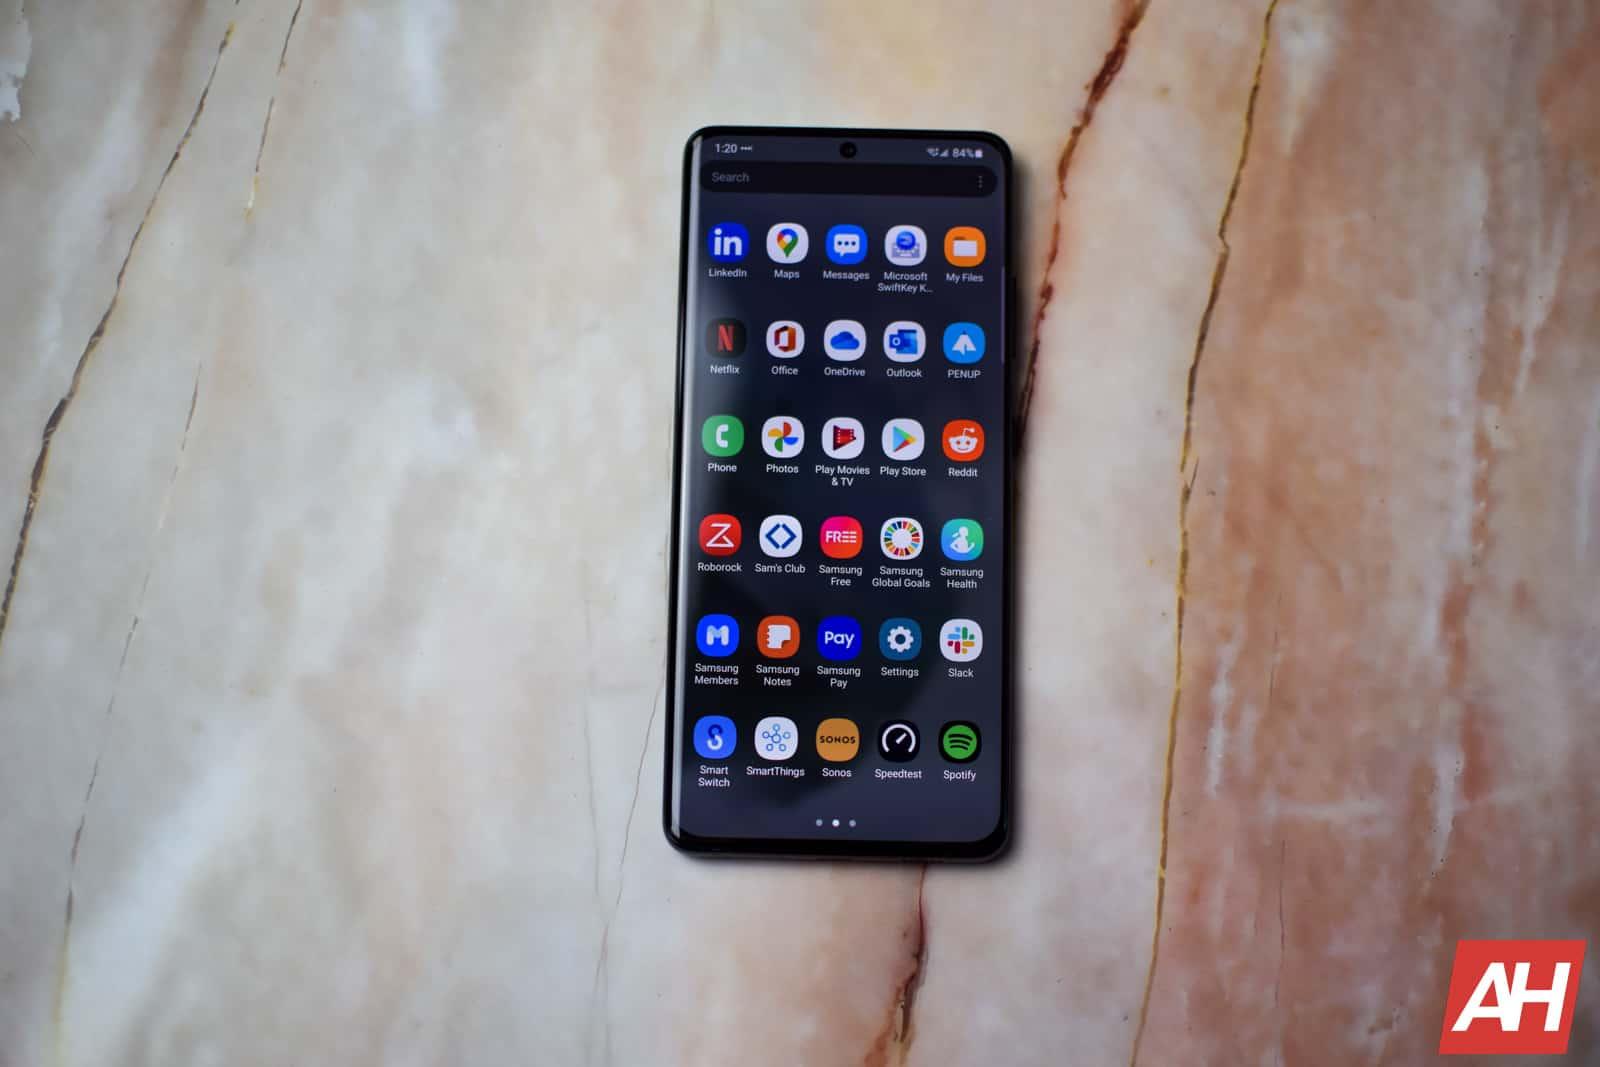 Samsung Galaxy S21 Ultra AH 06